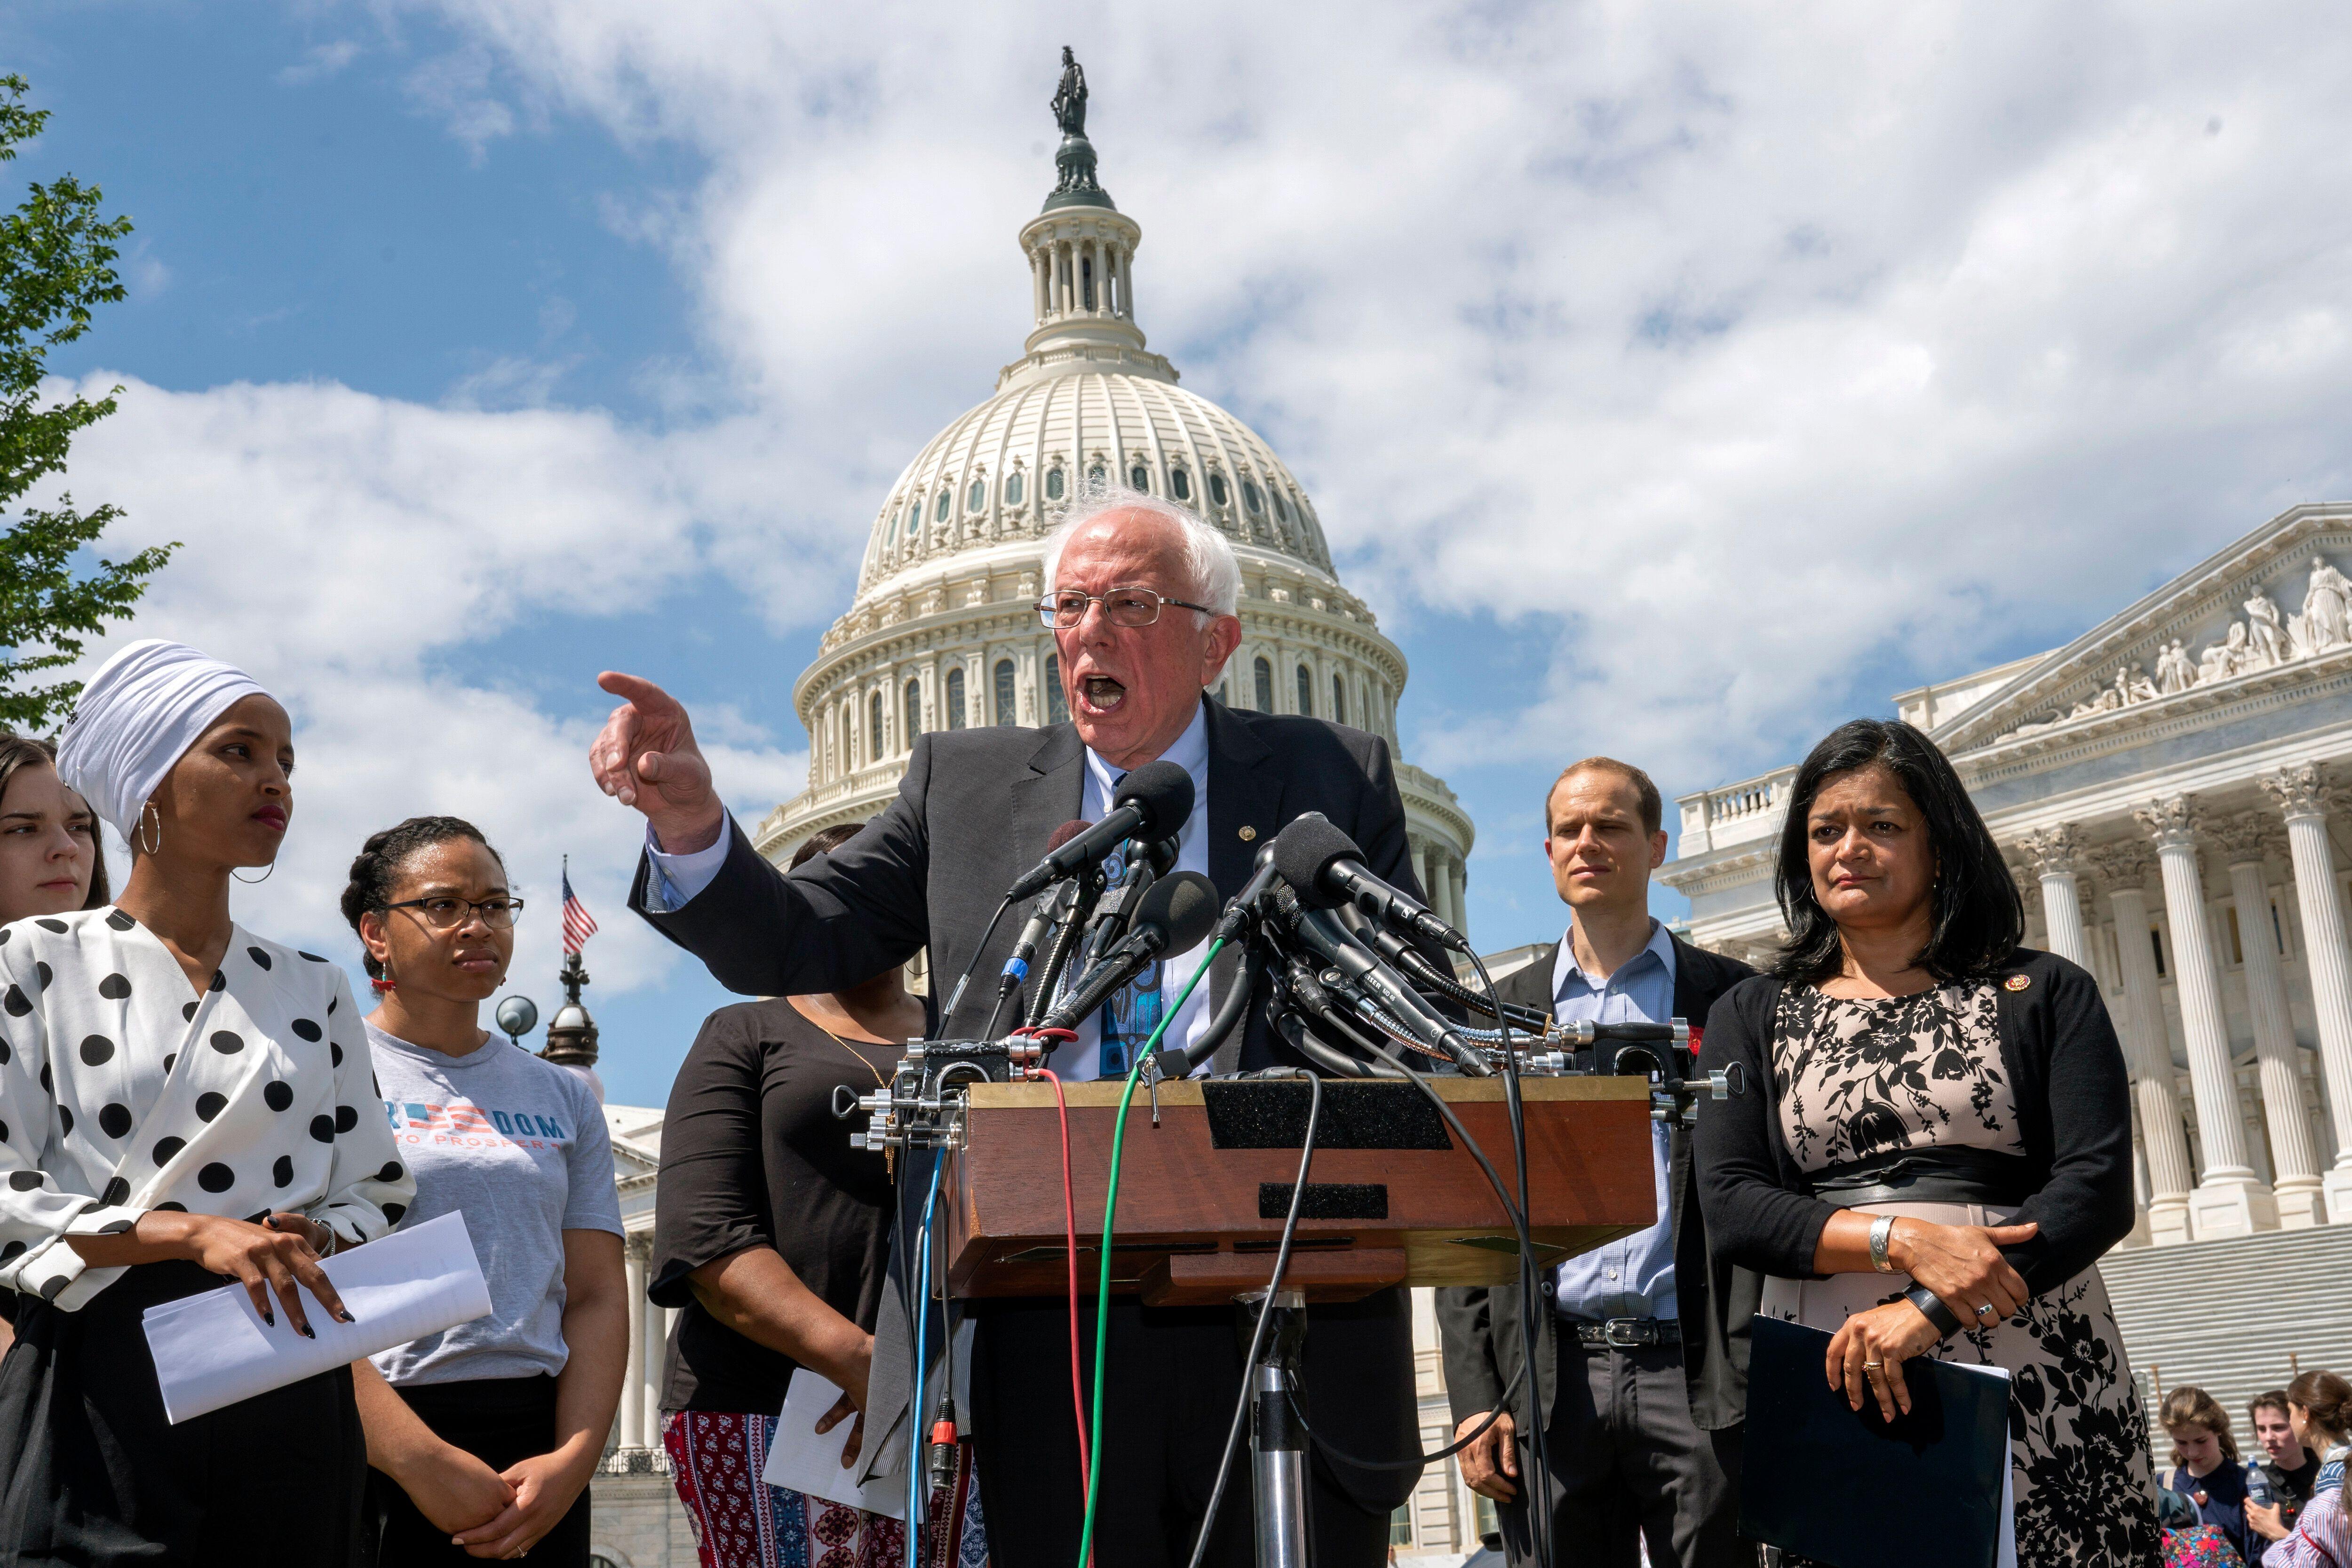 Democratic presidential candidate Bernie Sanders, flanked Monday by Rep. Ilhan Omar (D-Minn.), left, and Rep. Pramila Jayapal